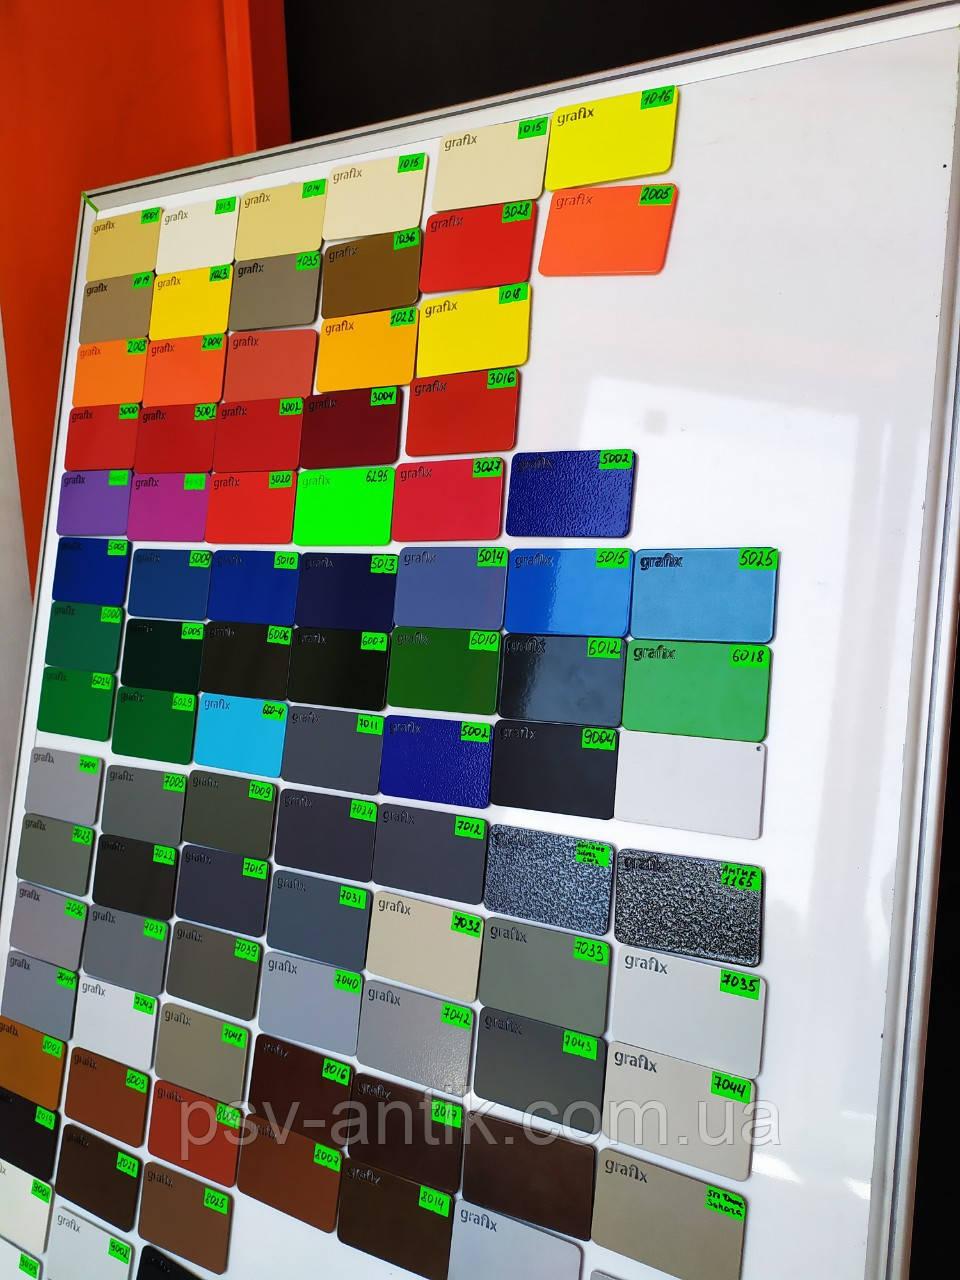 Порошковая краска глянцевая, полиэфирная, архитектурная, 7005